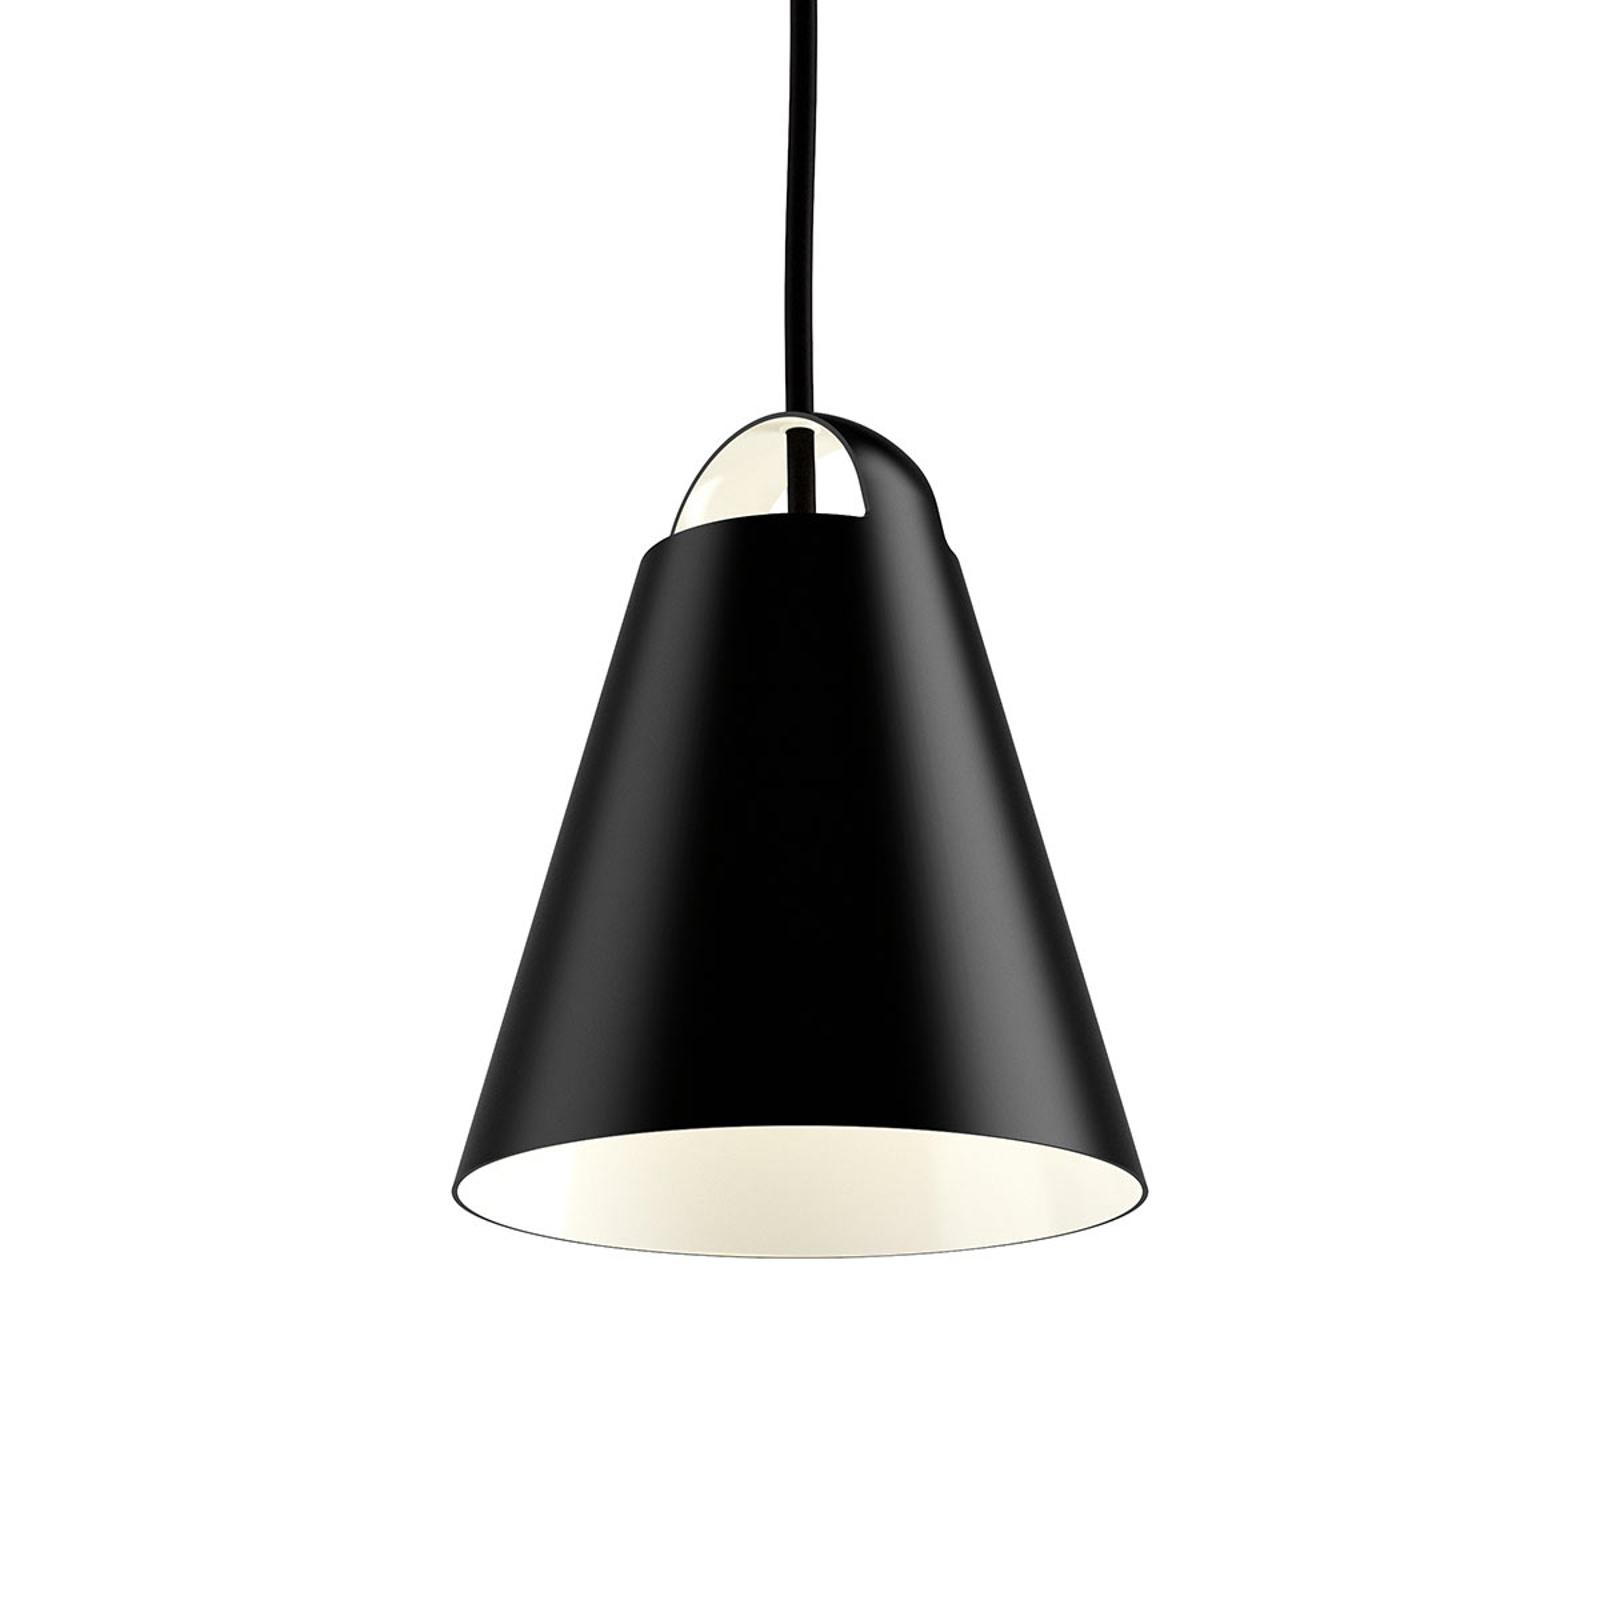 Design hanglamp Above, zwart, 17,5 cm